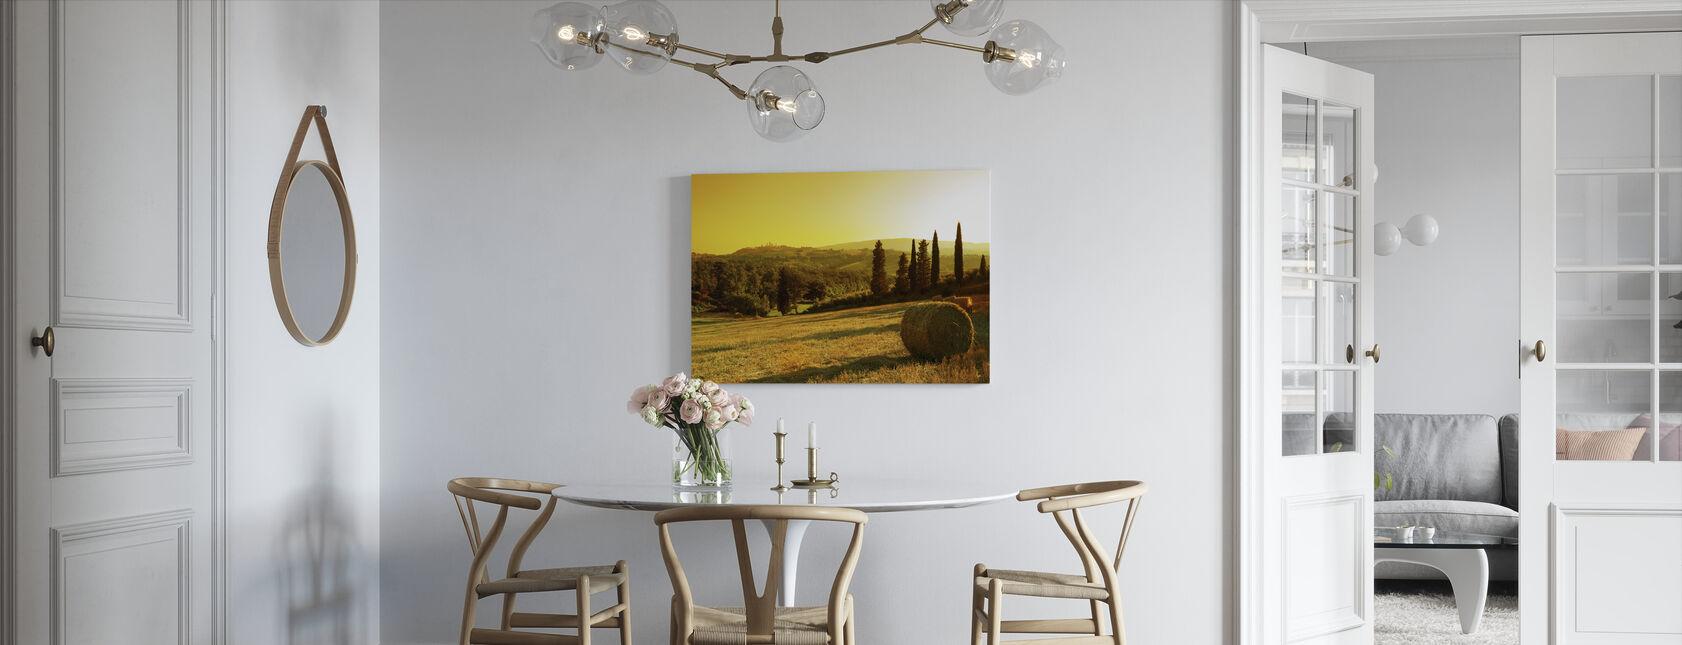 Sunset Toscana Landskap - Canvastavla - Kök